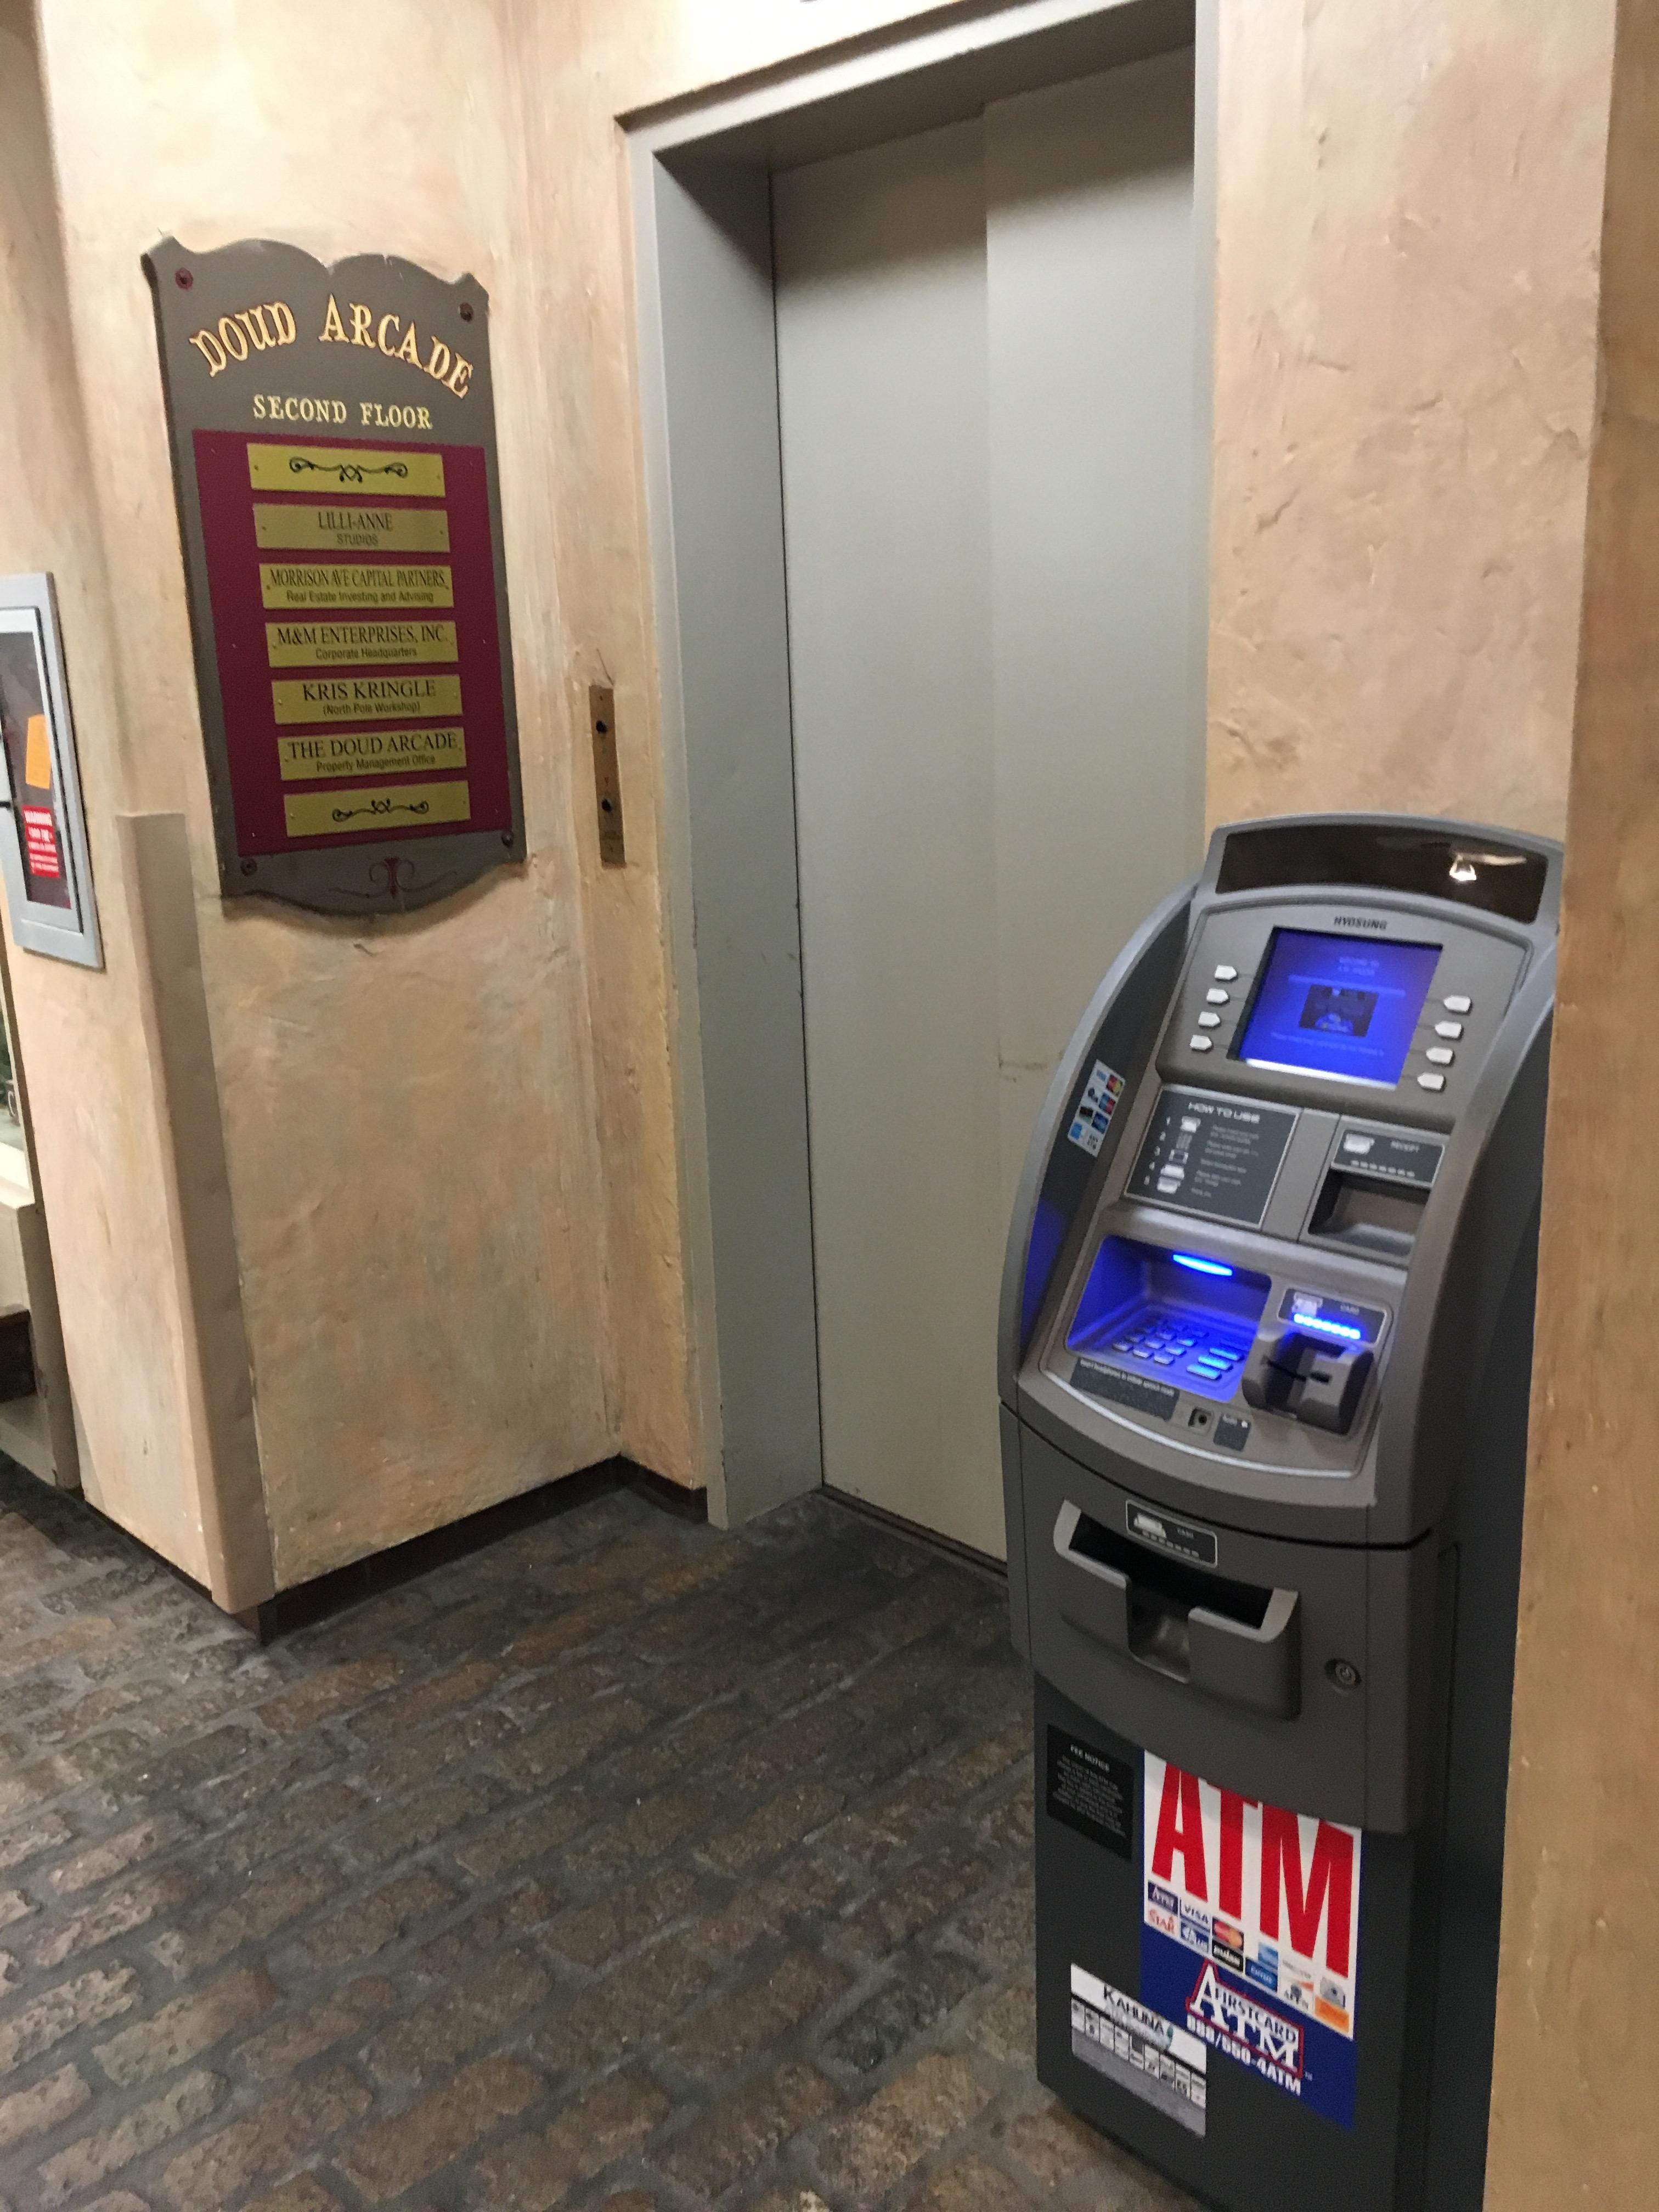 Doud Arcade ATM